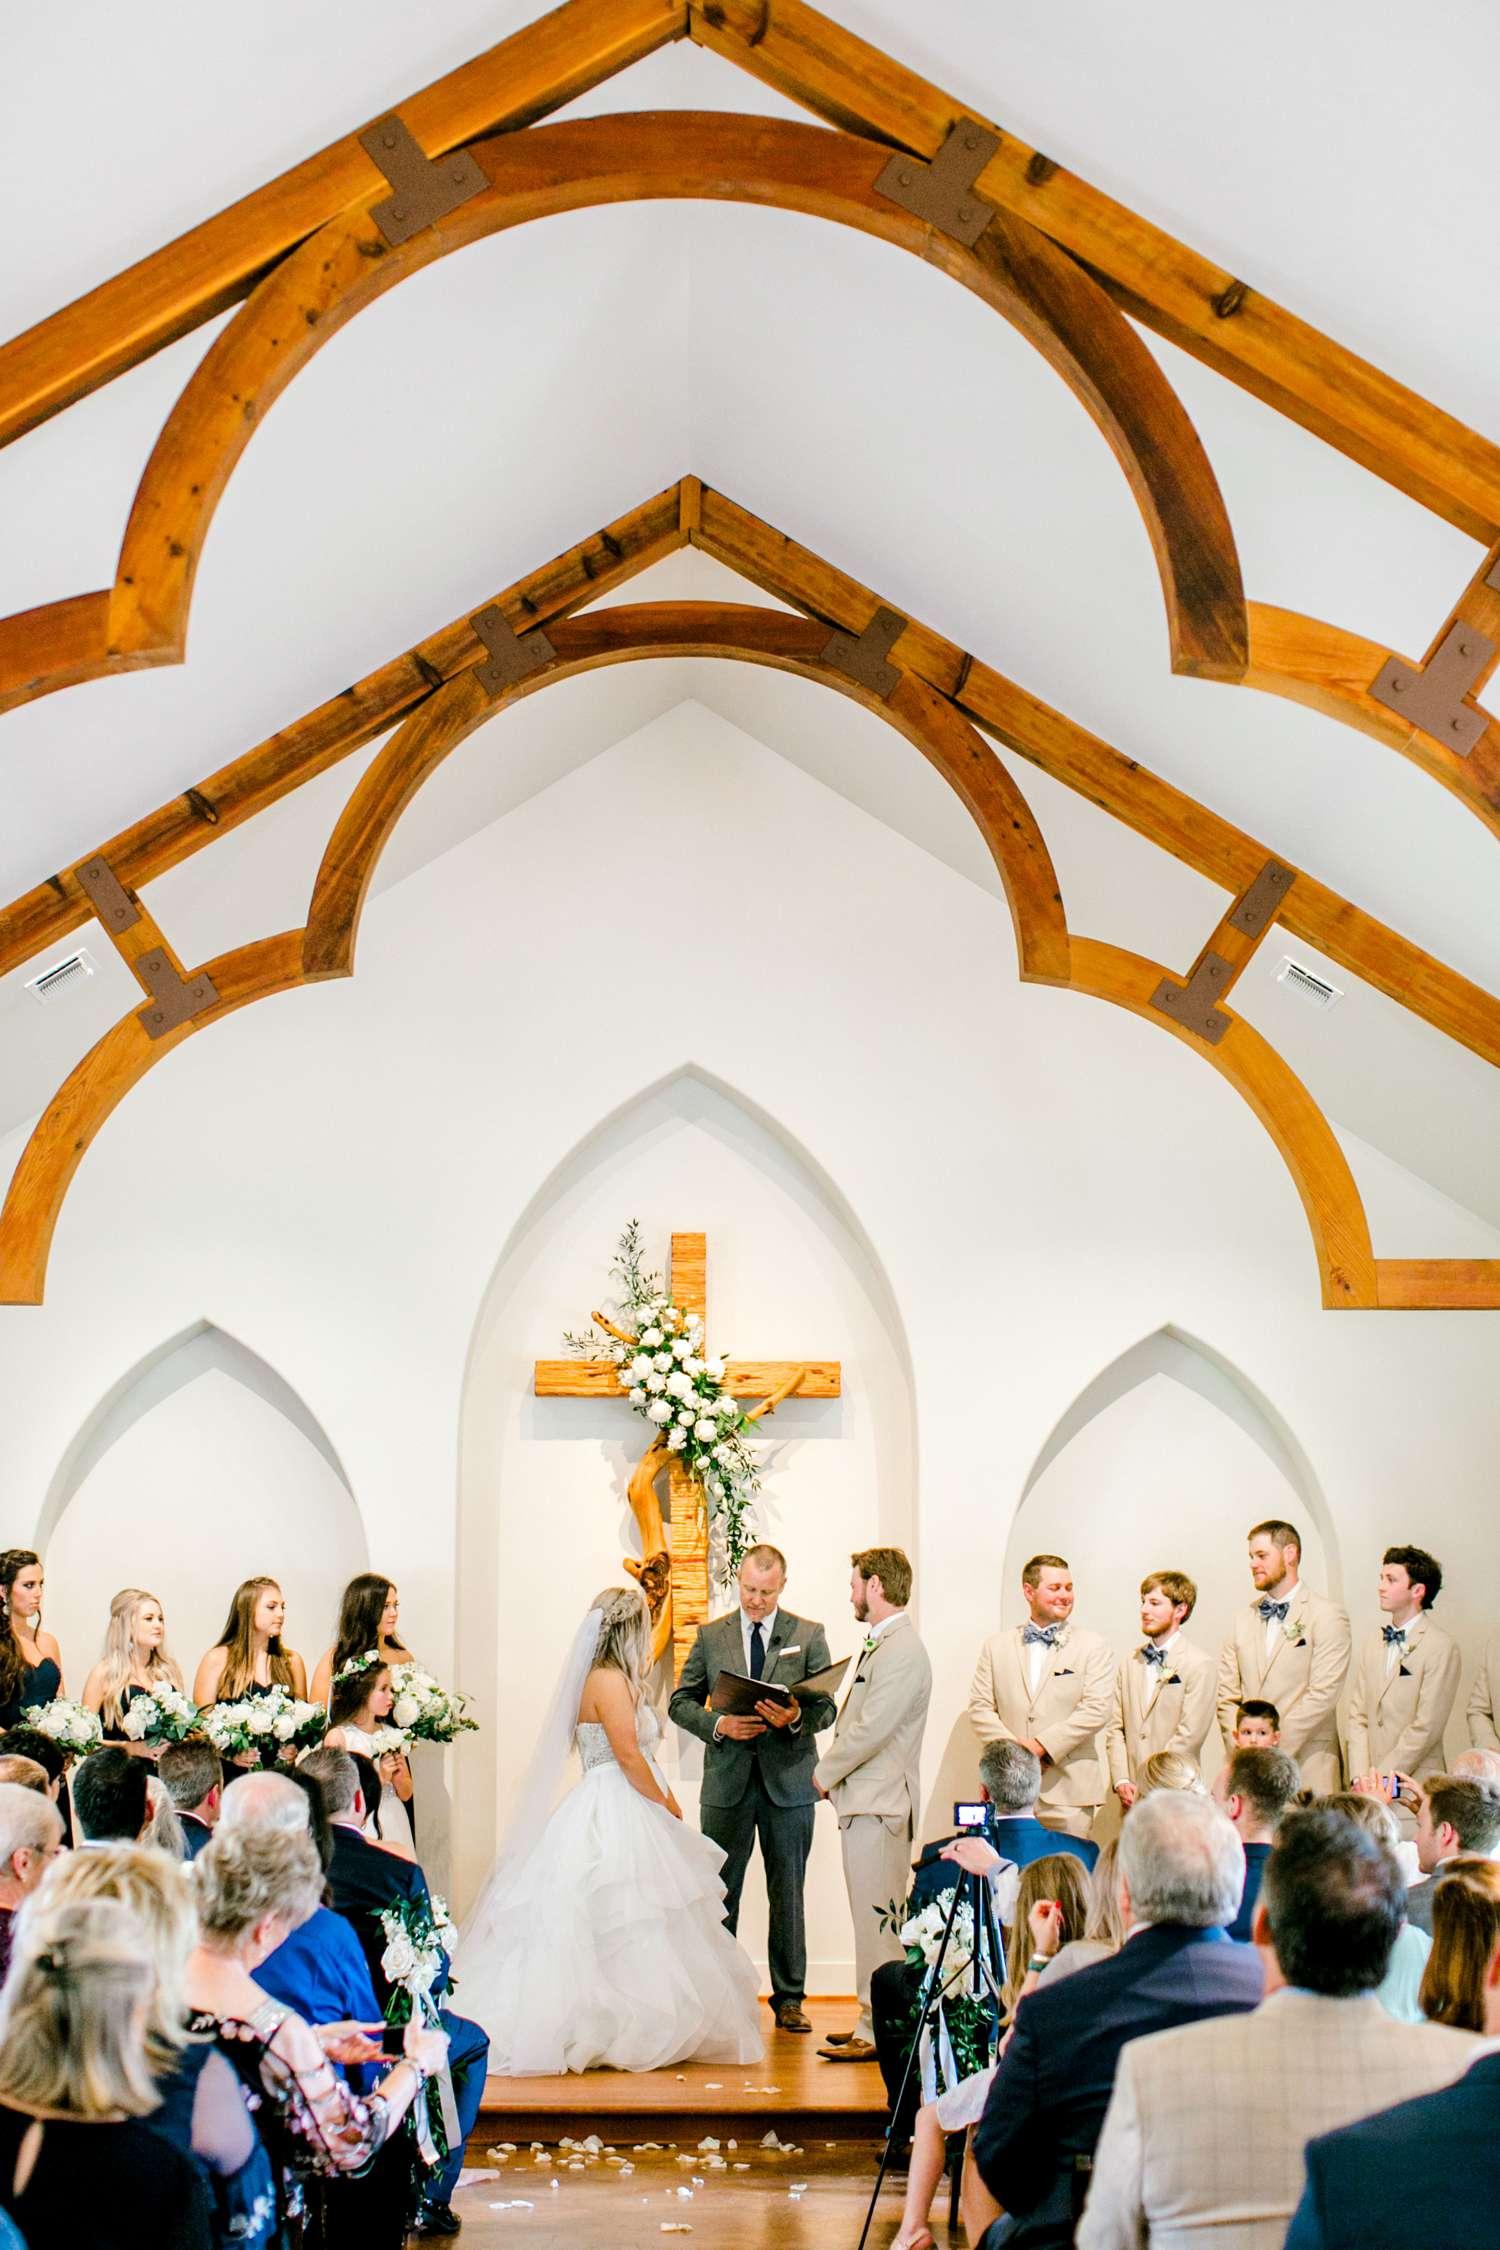 HAYLEE+JUSTIN+GREGORY+HERITAGE_HAUS_AUSTIN_TEXAS_WEDDING_0074.jpg